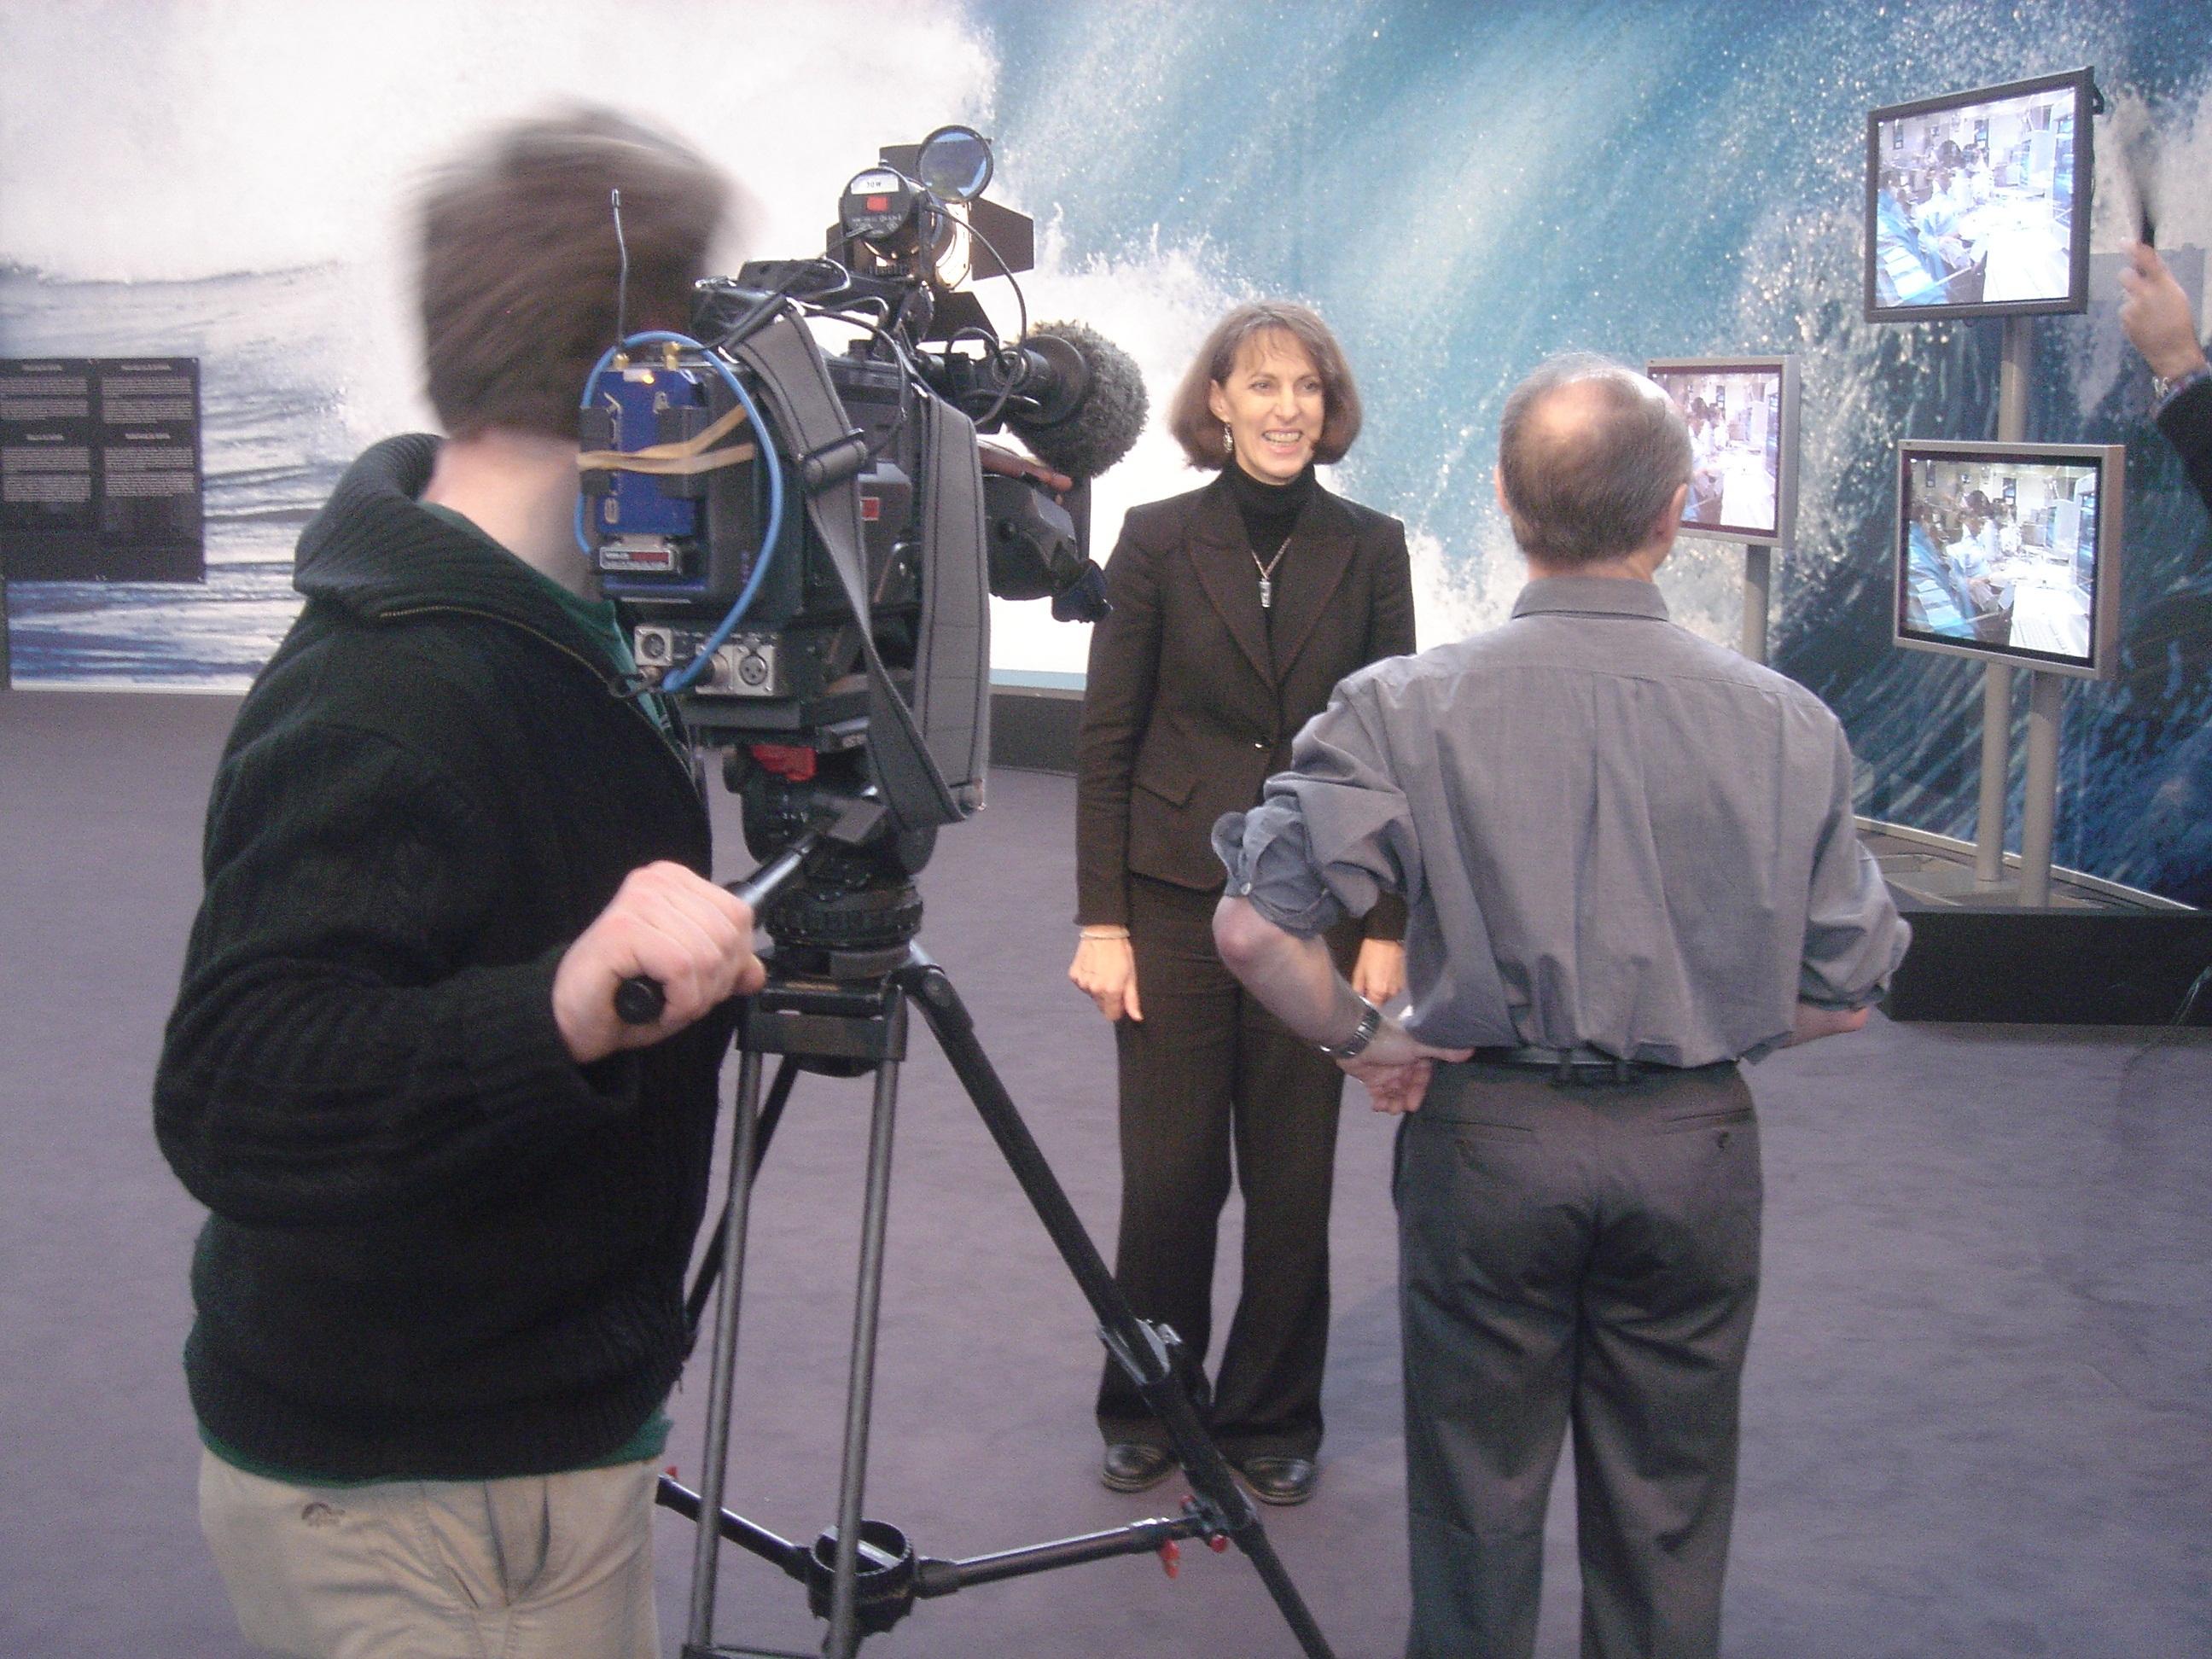 ESA Earth and Space Week - Brussels April 2005